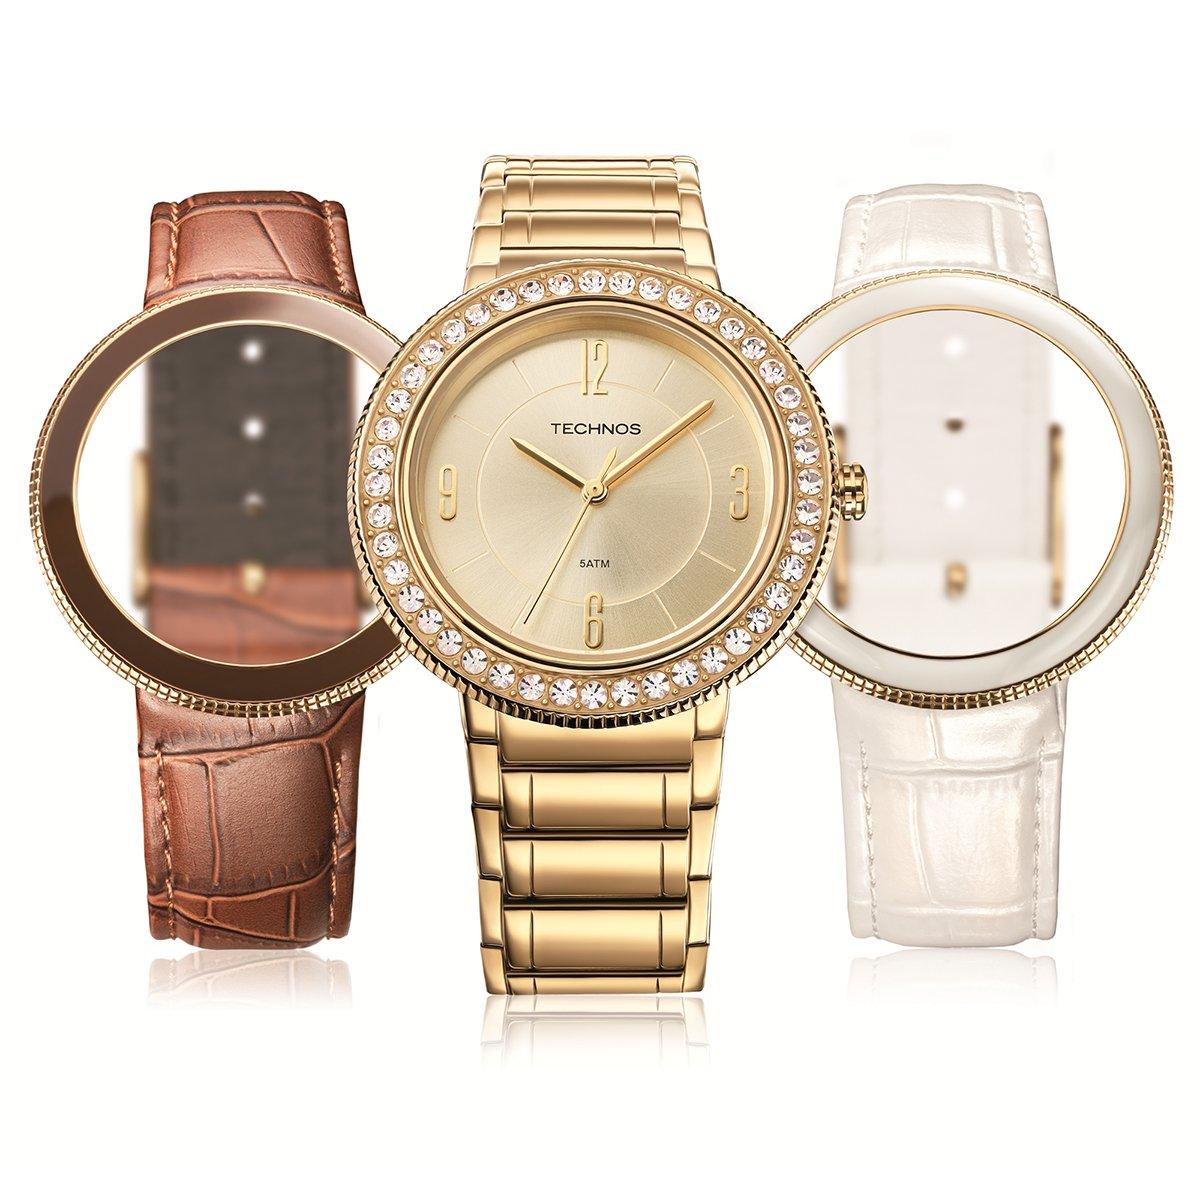 6074113329e Relógio Technos Cristal - Compre Agora